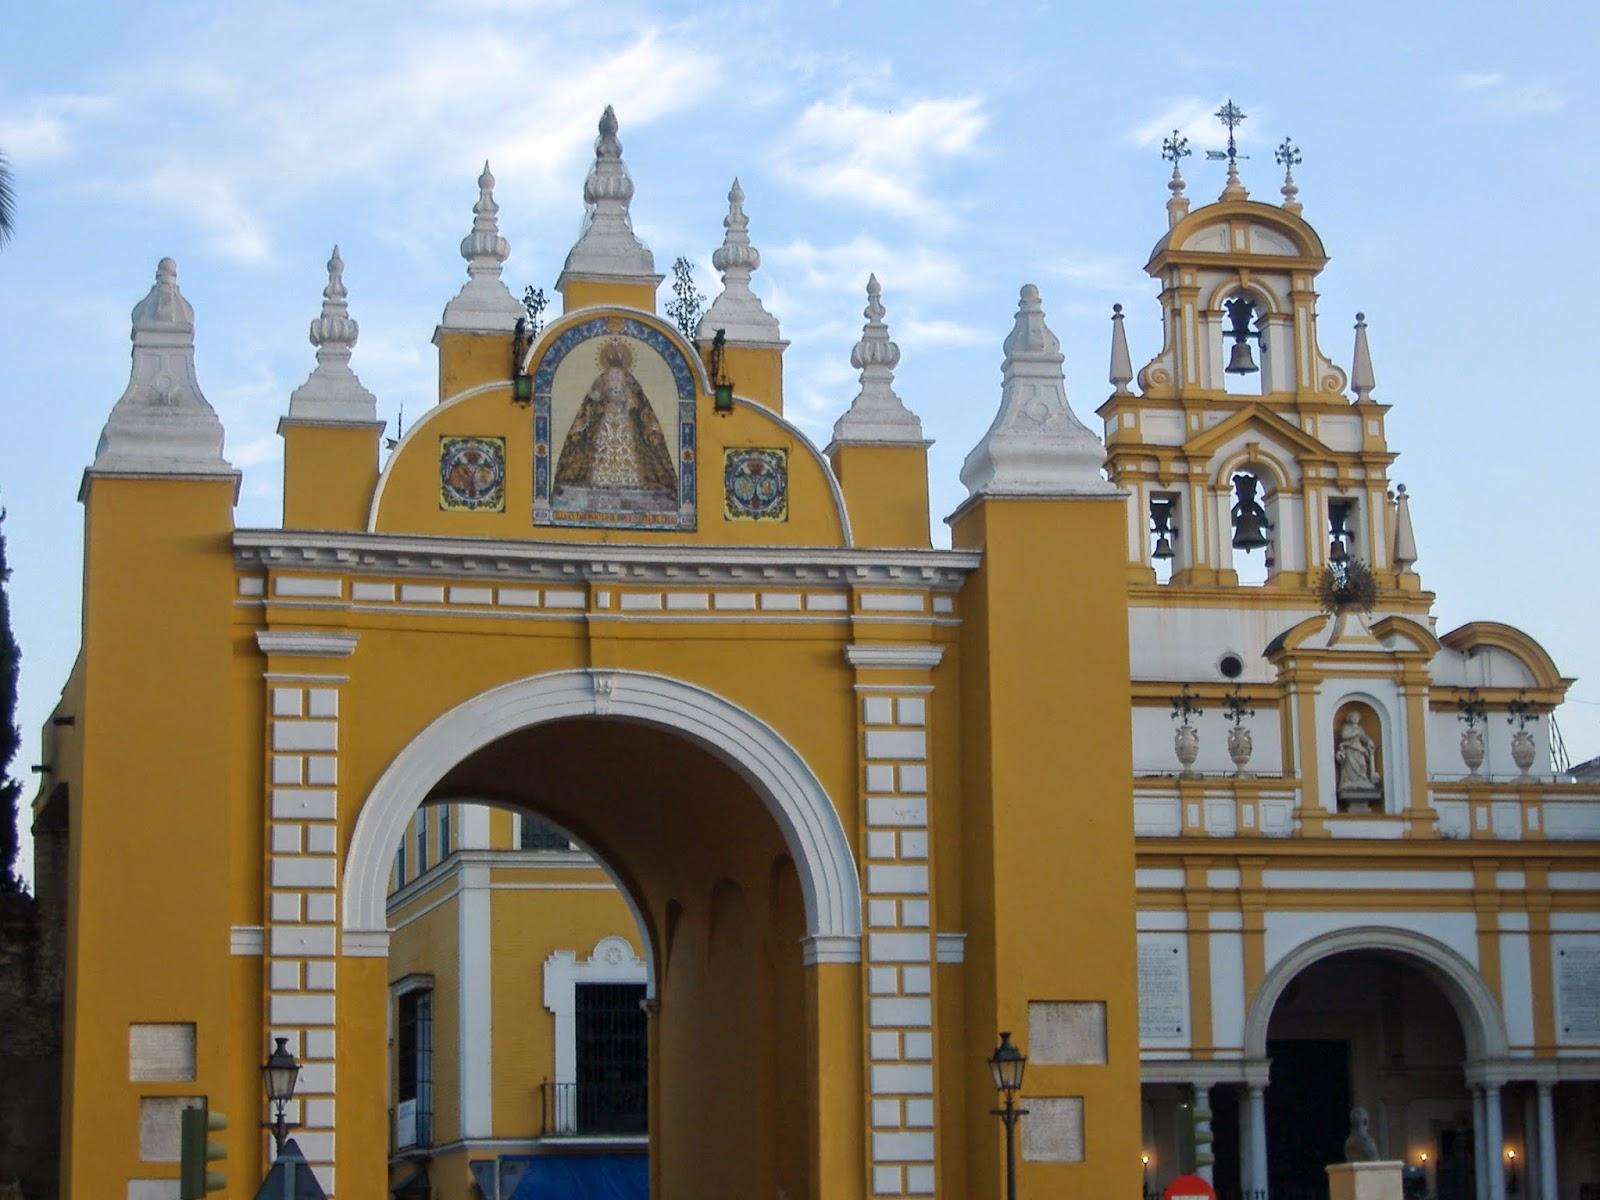 Arco de la macarena. Sevilla. Fuente: Historiarte Sevilla